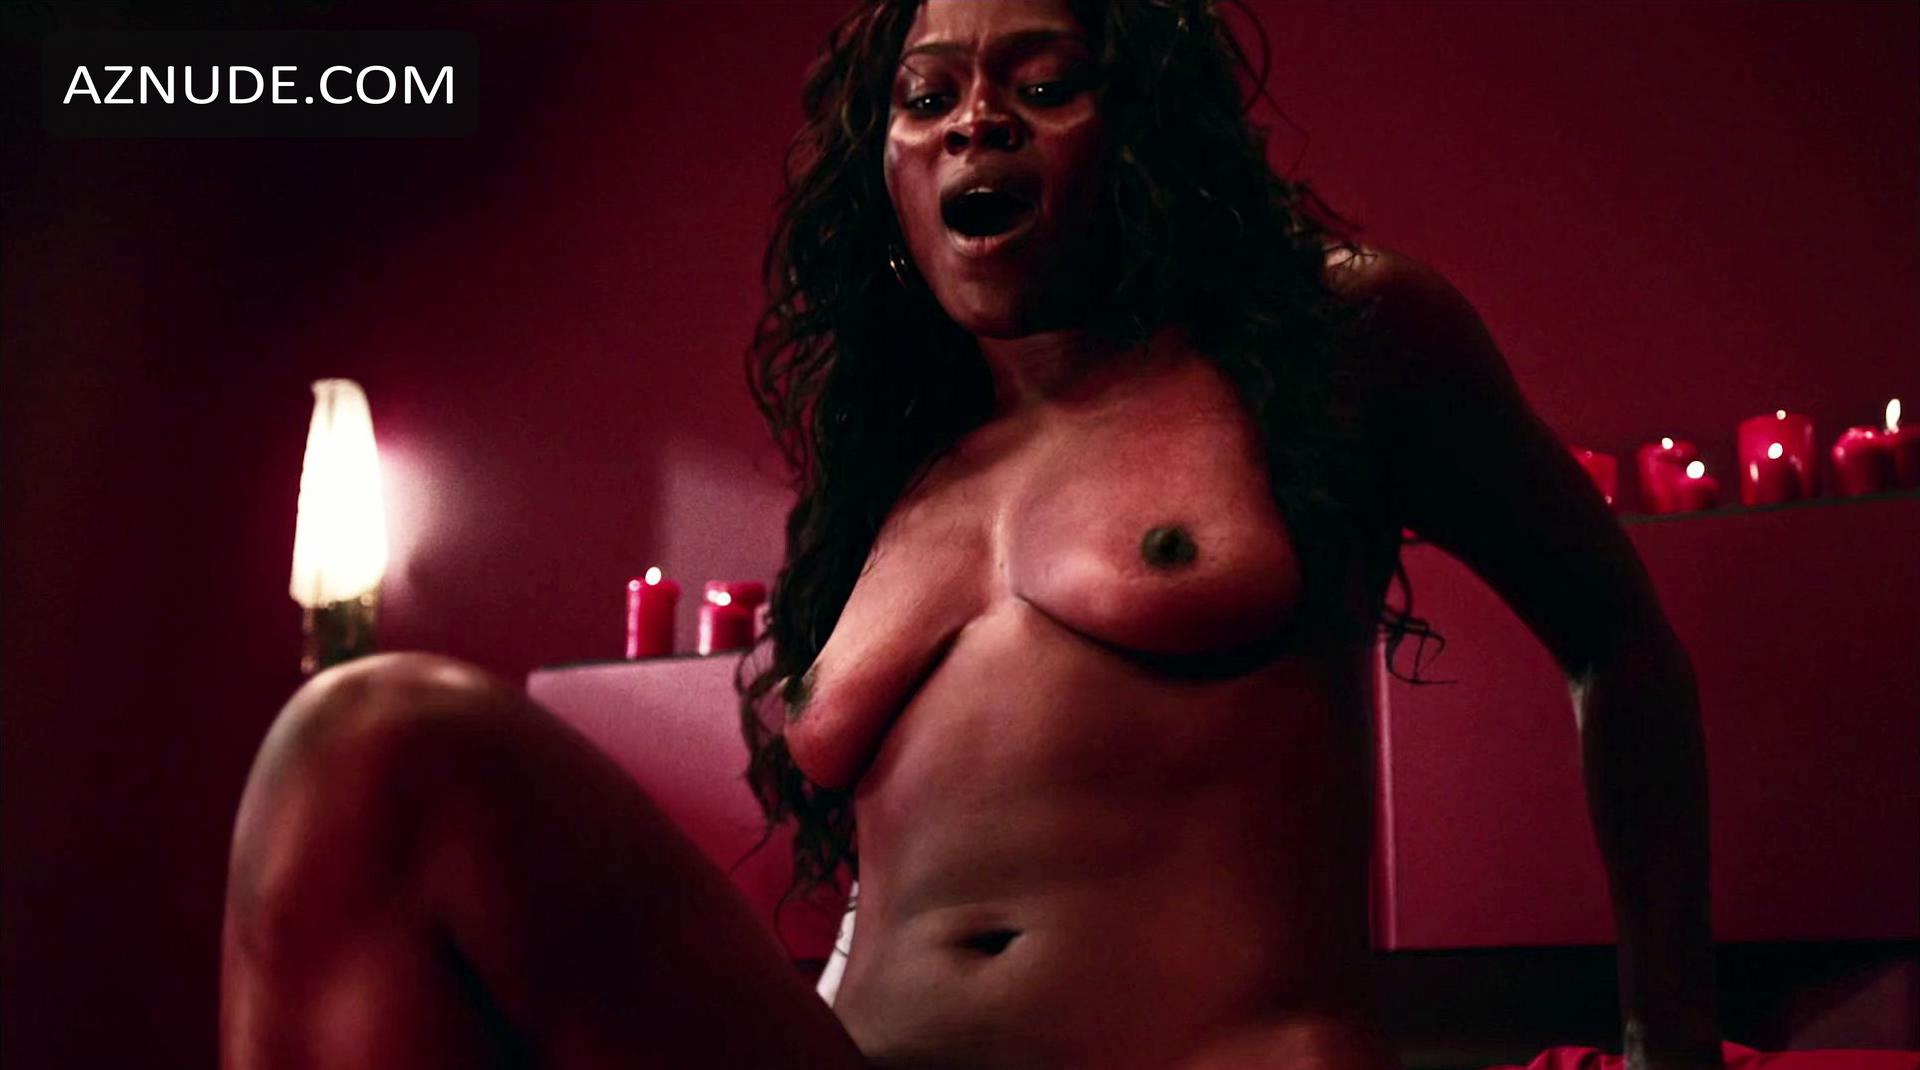 XXX Yetide Badaki nude (42 photos), Topless, Sideboobs, Feet, legs 2020